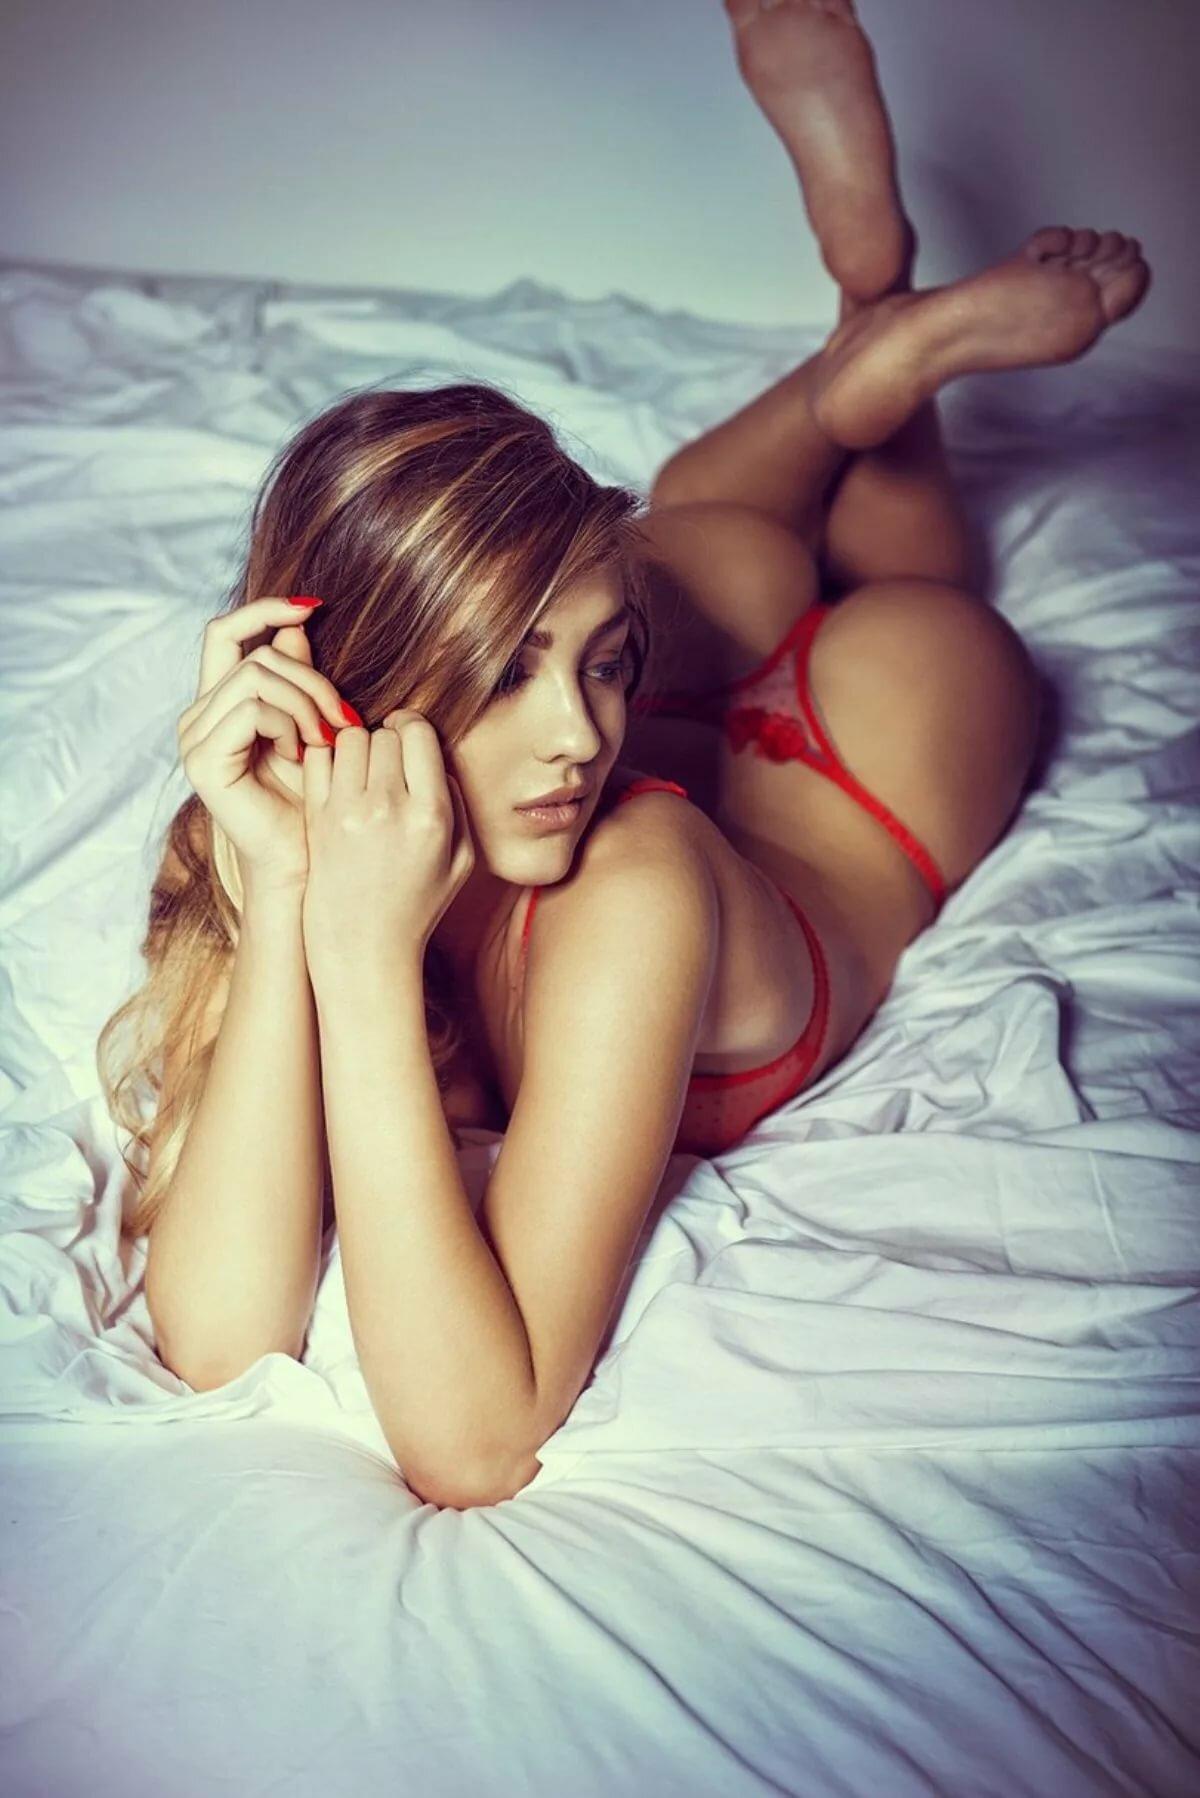 Erotic photography of girlfriend pics emo